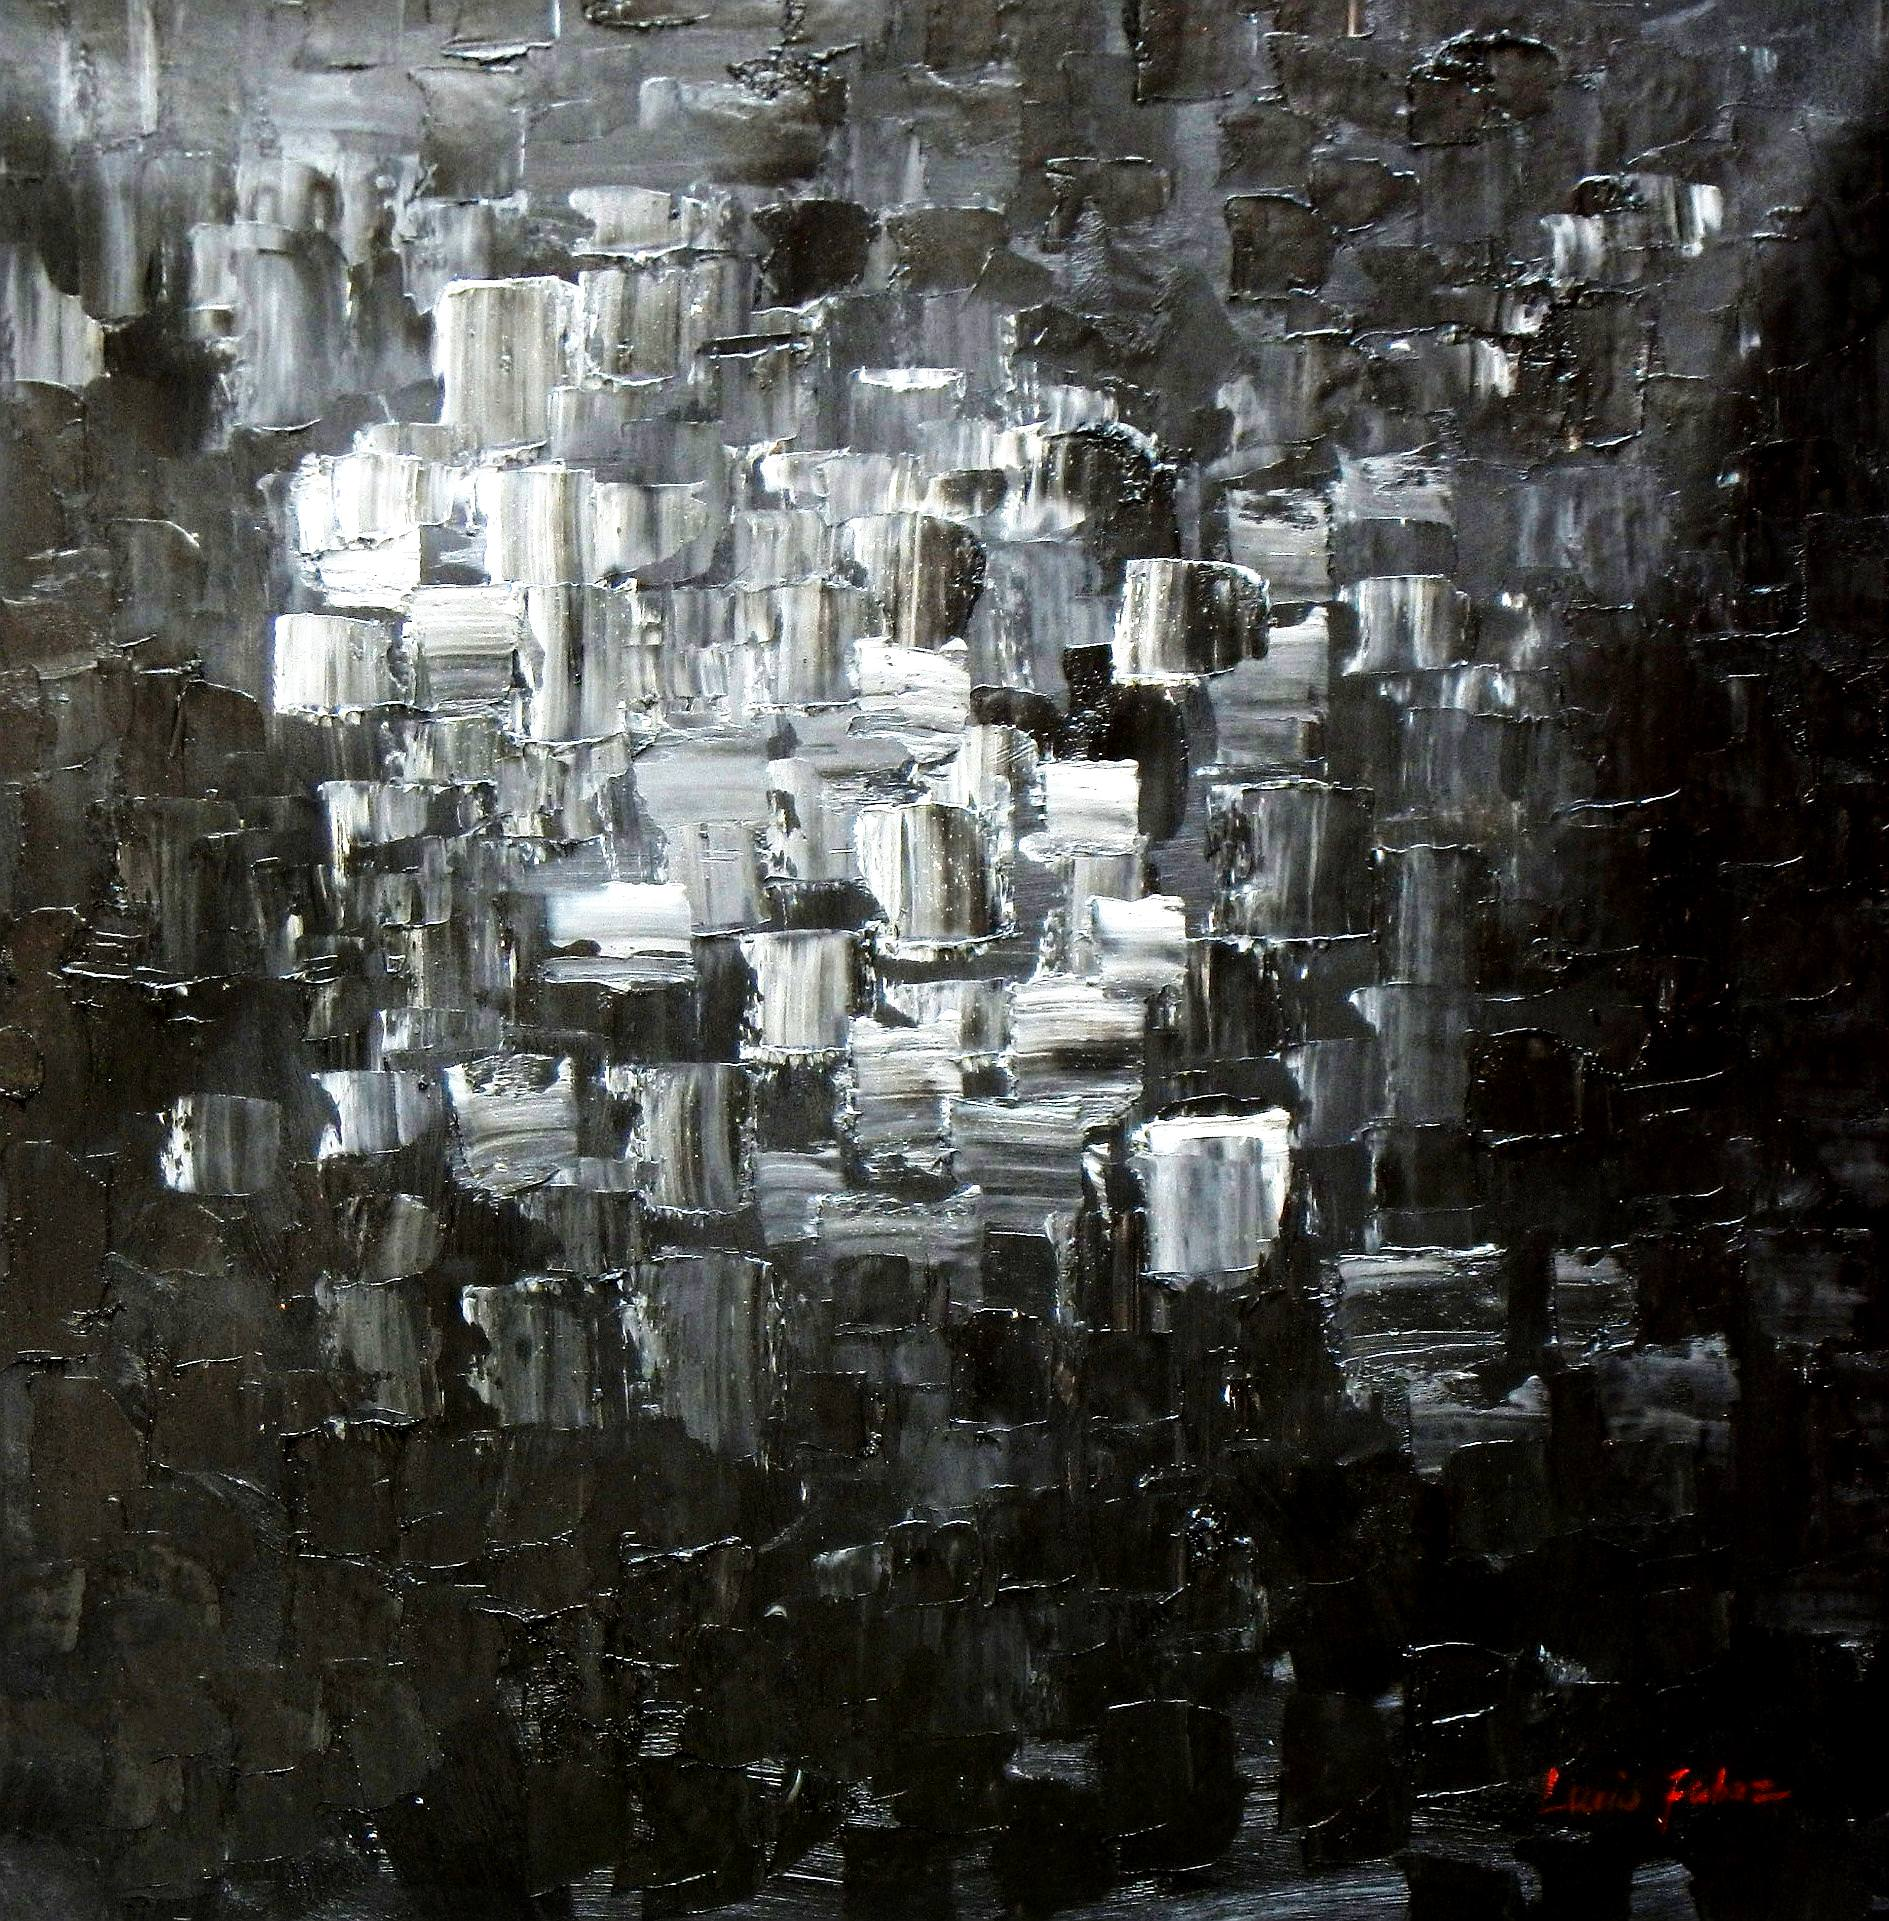 Abstrakt - Nacht in New York g93475 80x80cm Ölgemälde handgemalt